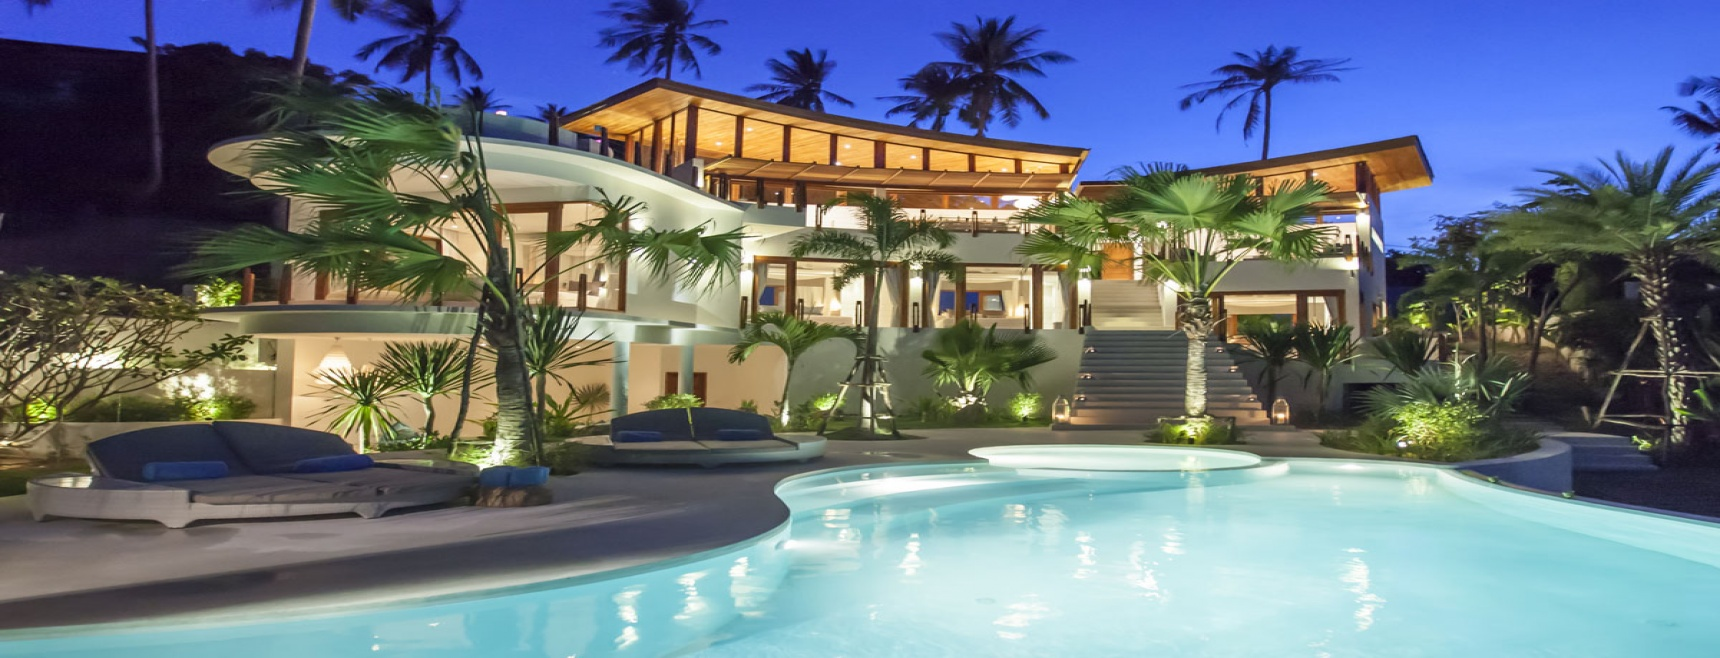 Villa Kya Luxury Villa For Sale Bophut Koh Samui (Thai-Real.com)